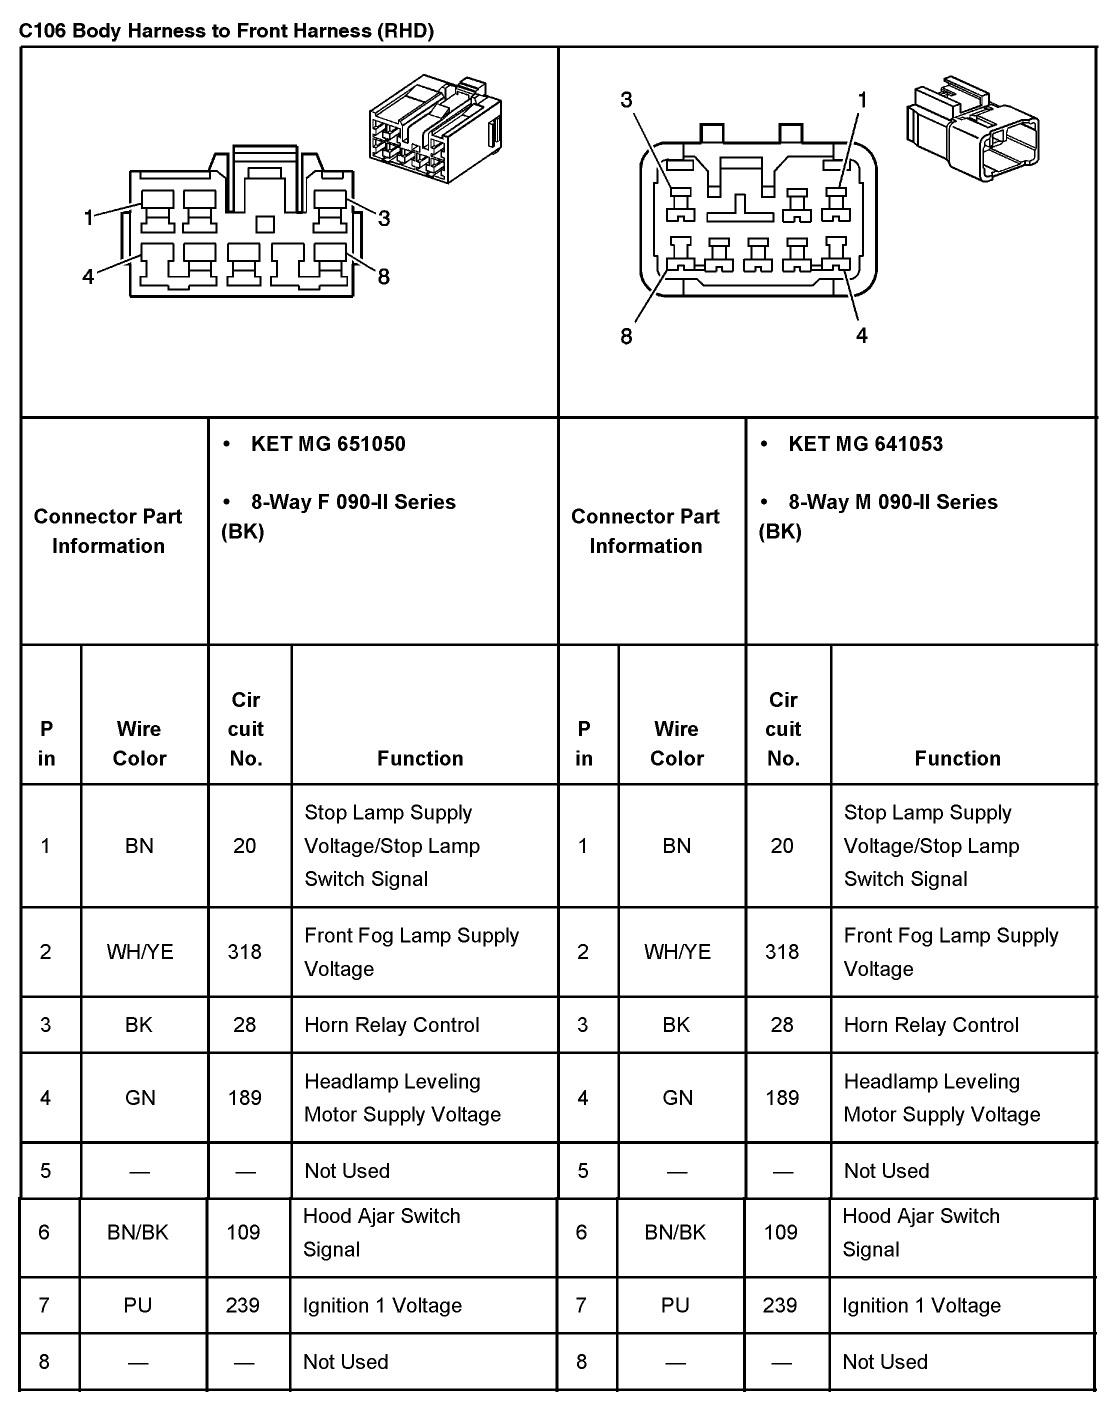 Chevy aveo alternator wiring diagram get free image